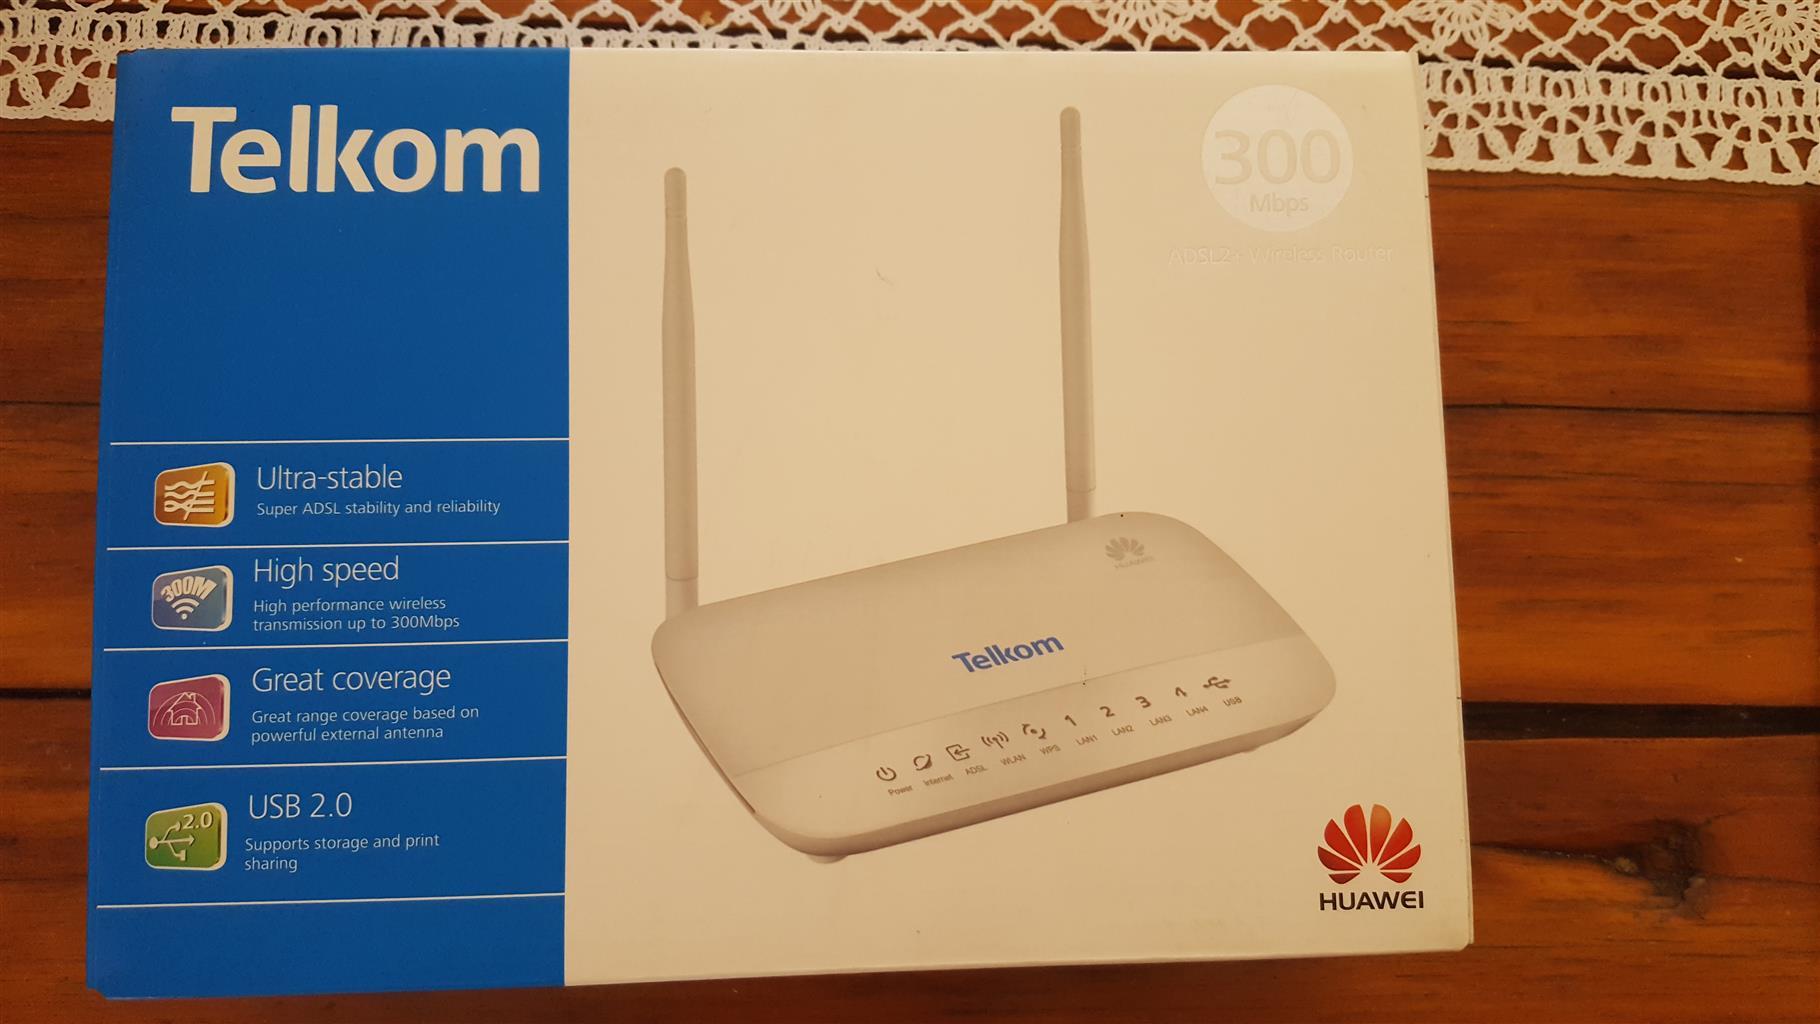 Telkom Huawei Adsl 2 Wireless Router Junk Mail